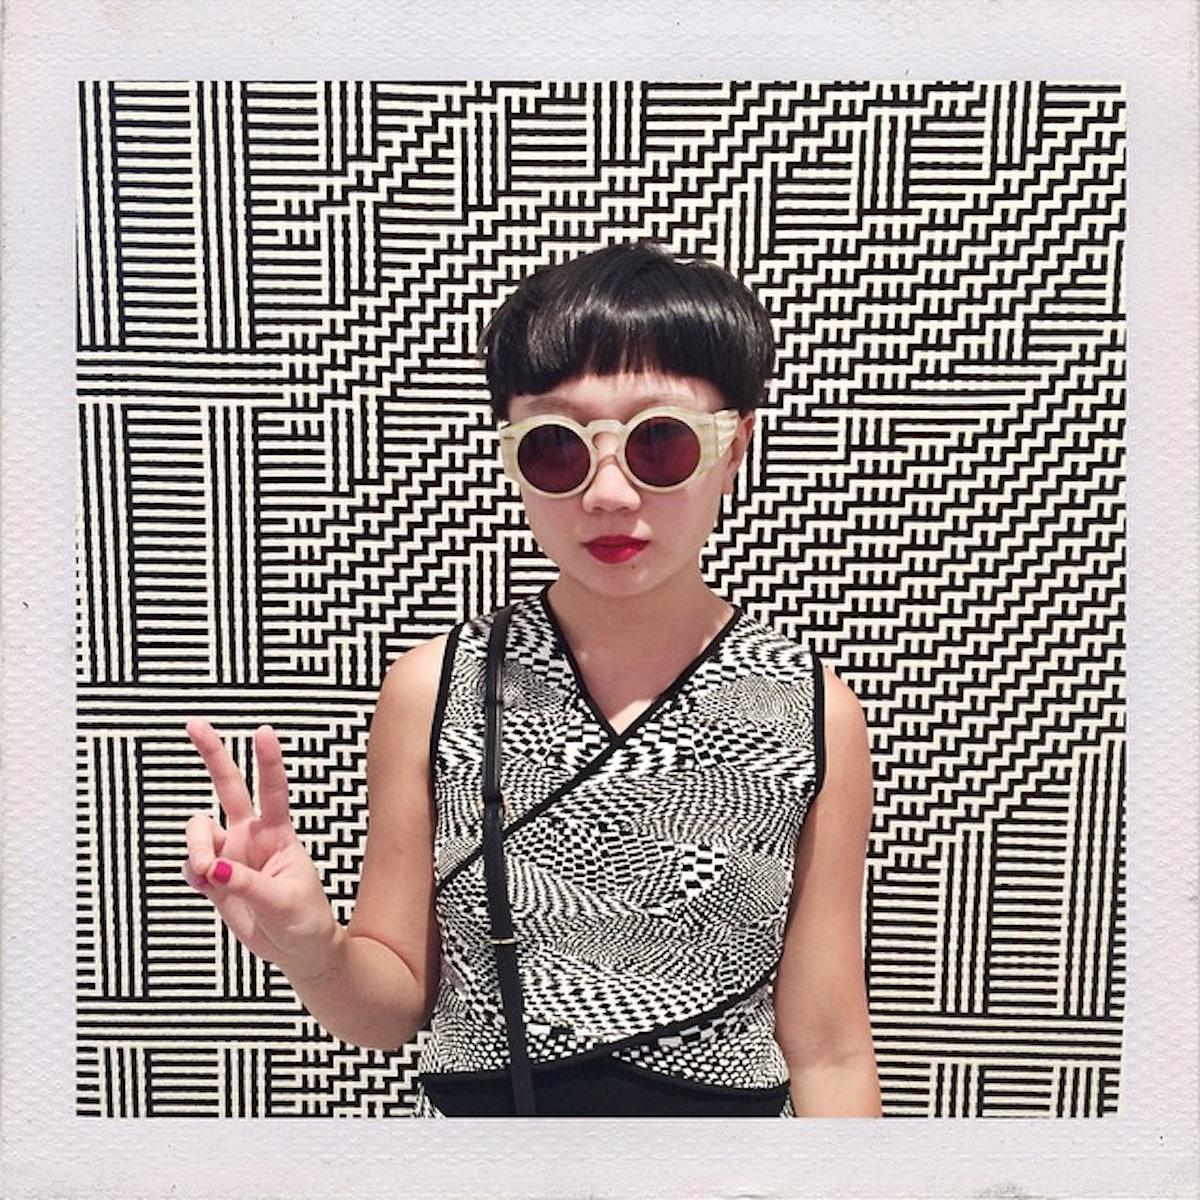 With a Tauba Auerbach piece at the De la Cruz Collection in Miami